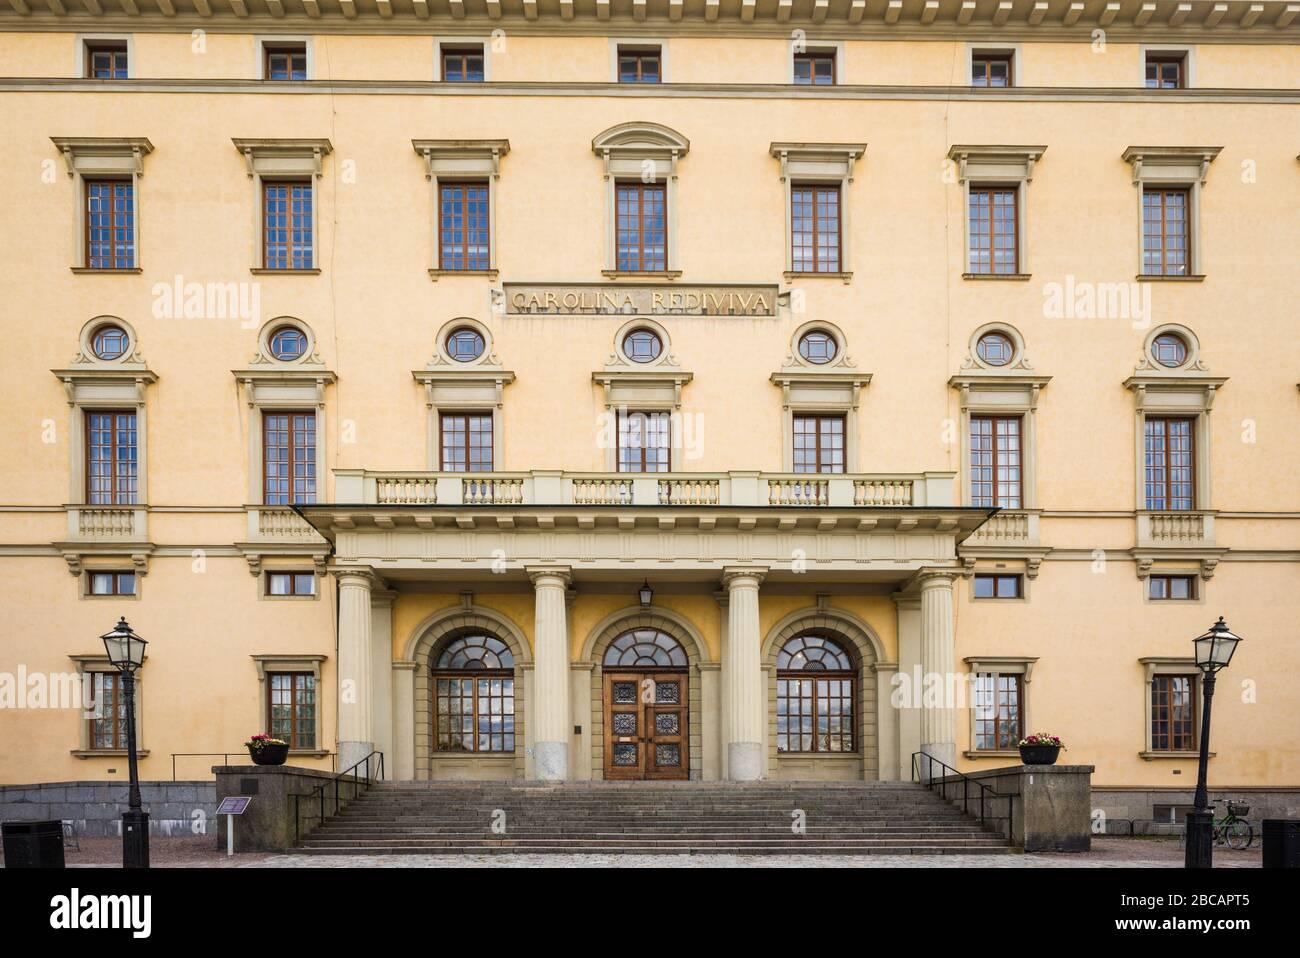 Sweden, Central Sweden, Uppsala, Carolina Rediviva Library, exterior Stock Photo